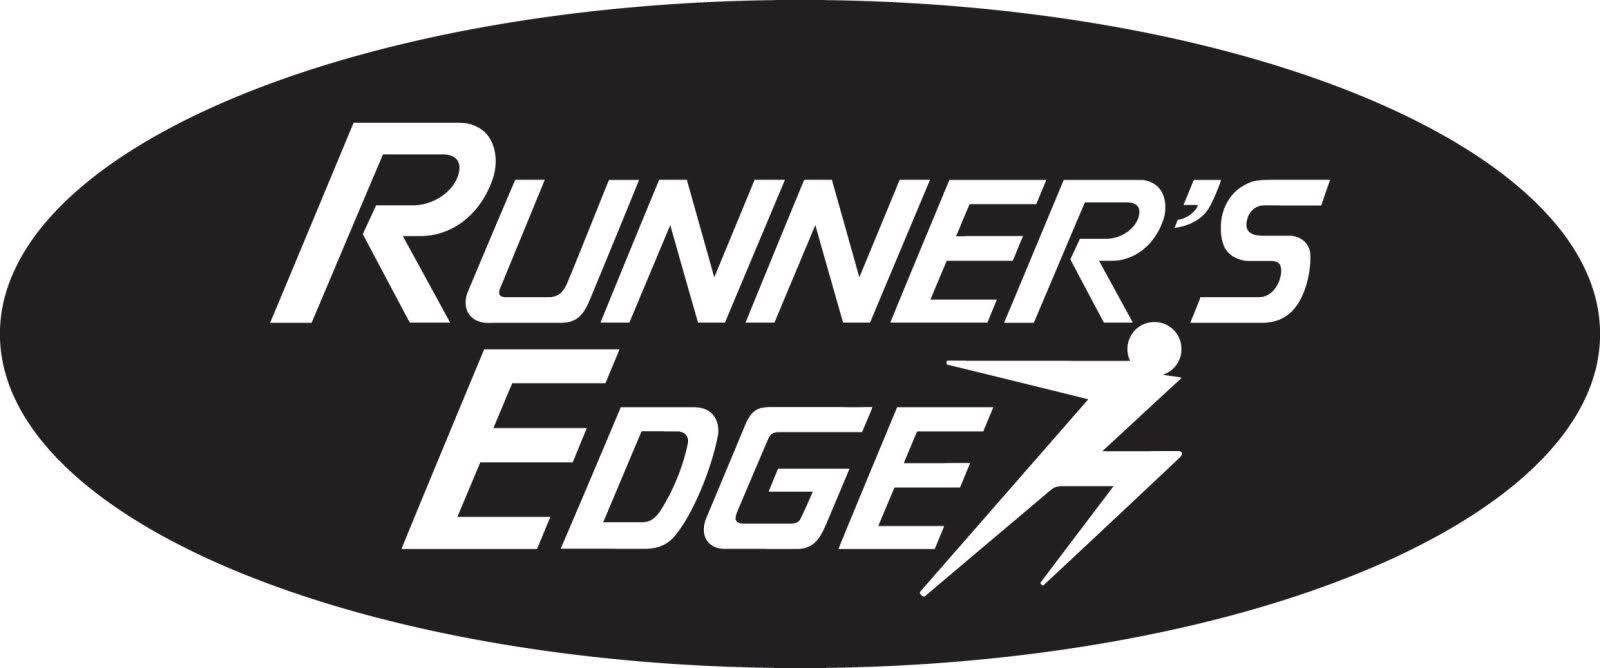 The Runners Edge